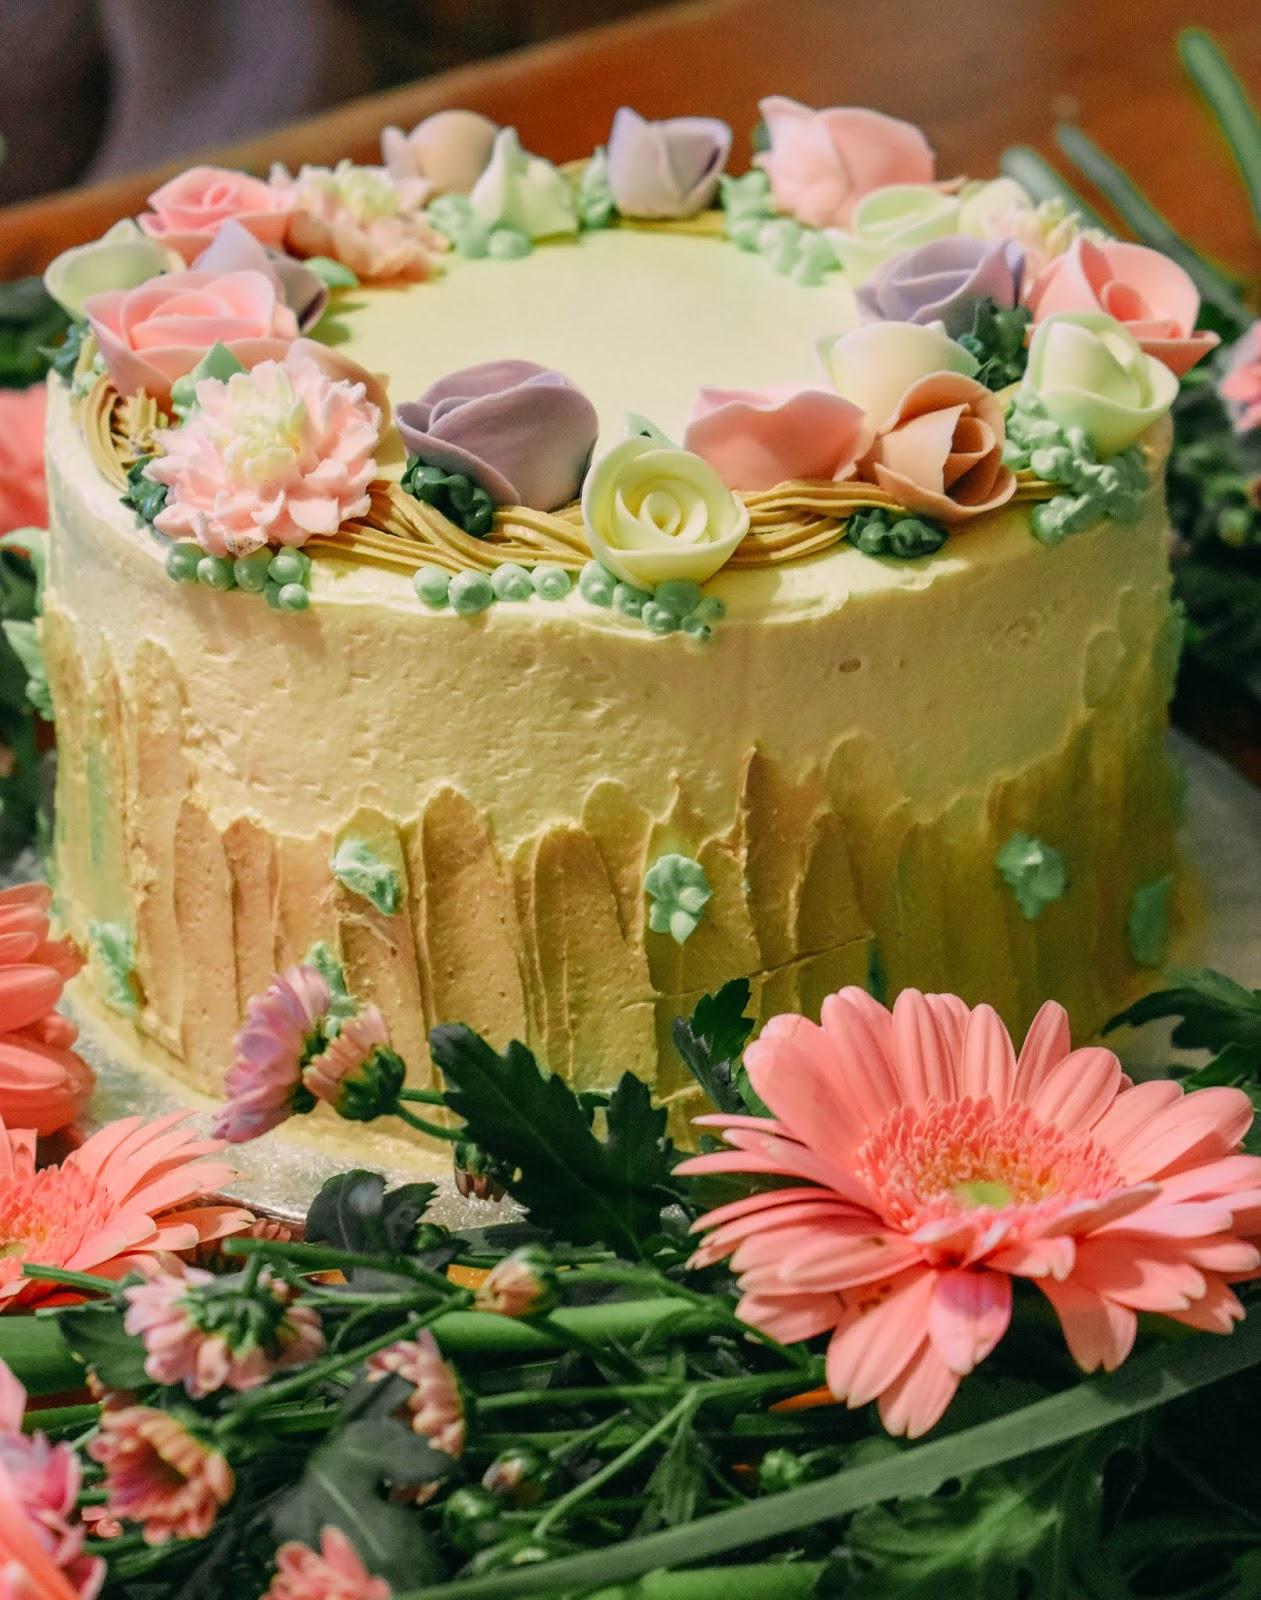 Enjoyable Pretty Pastel Flower Birthday Cake Dolly Dowsie Personalised Birthday Cards Cominlily Jamesorg